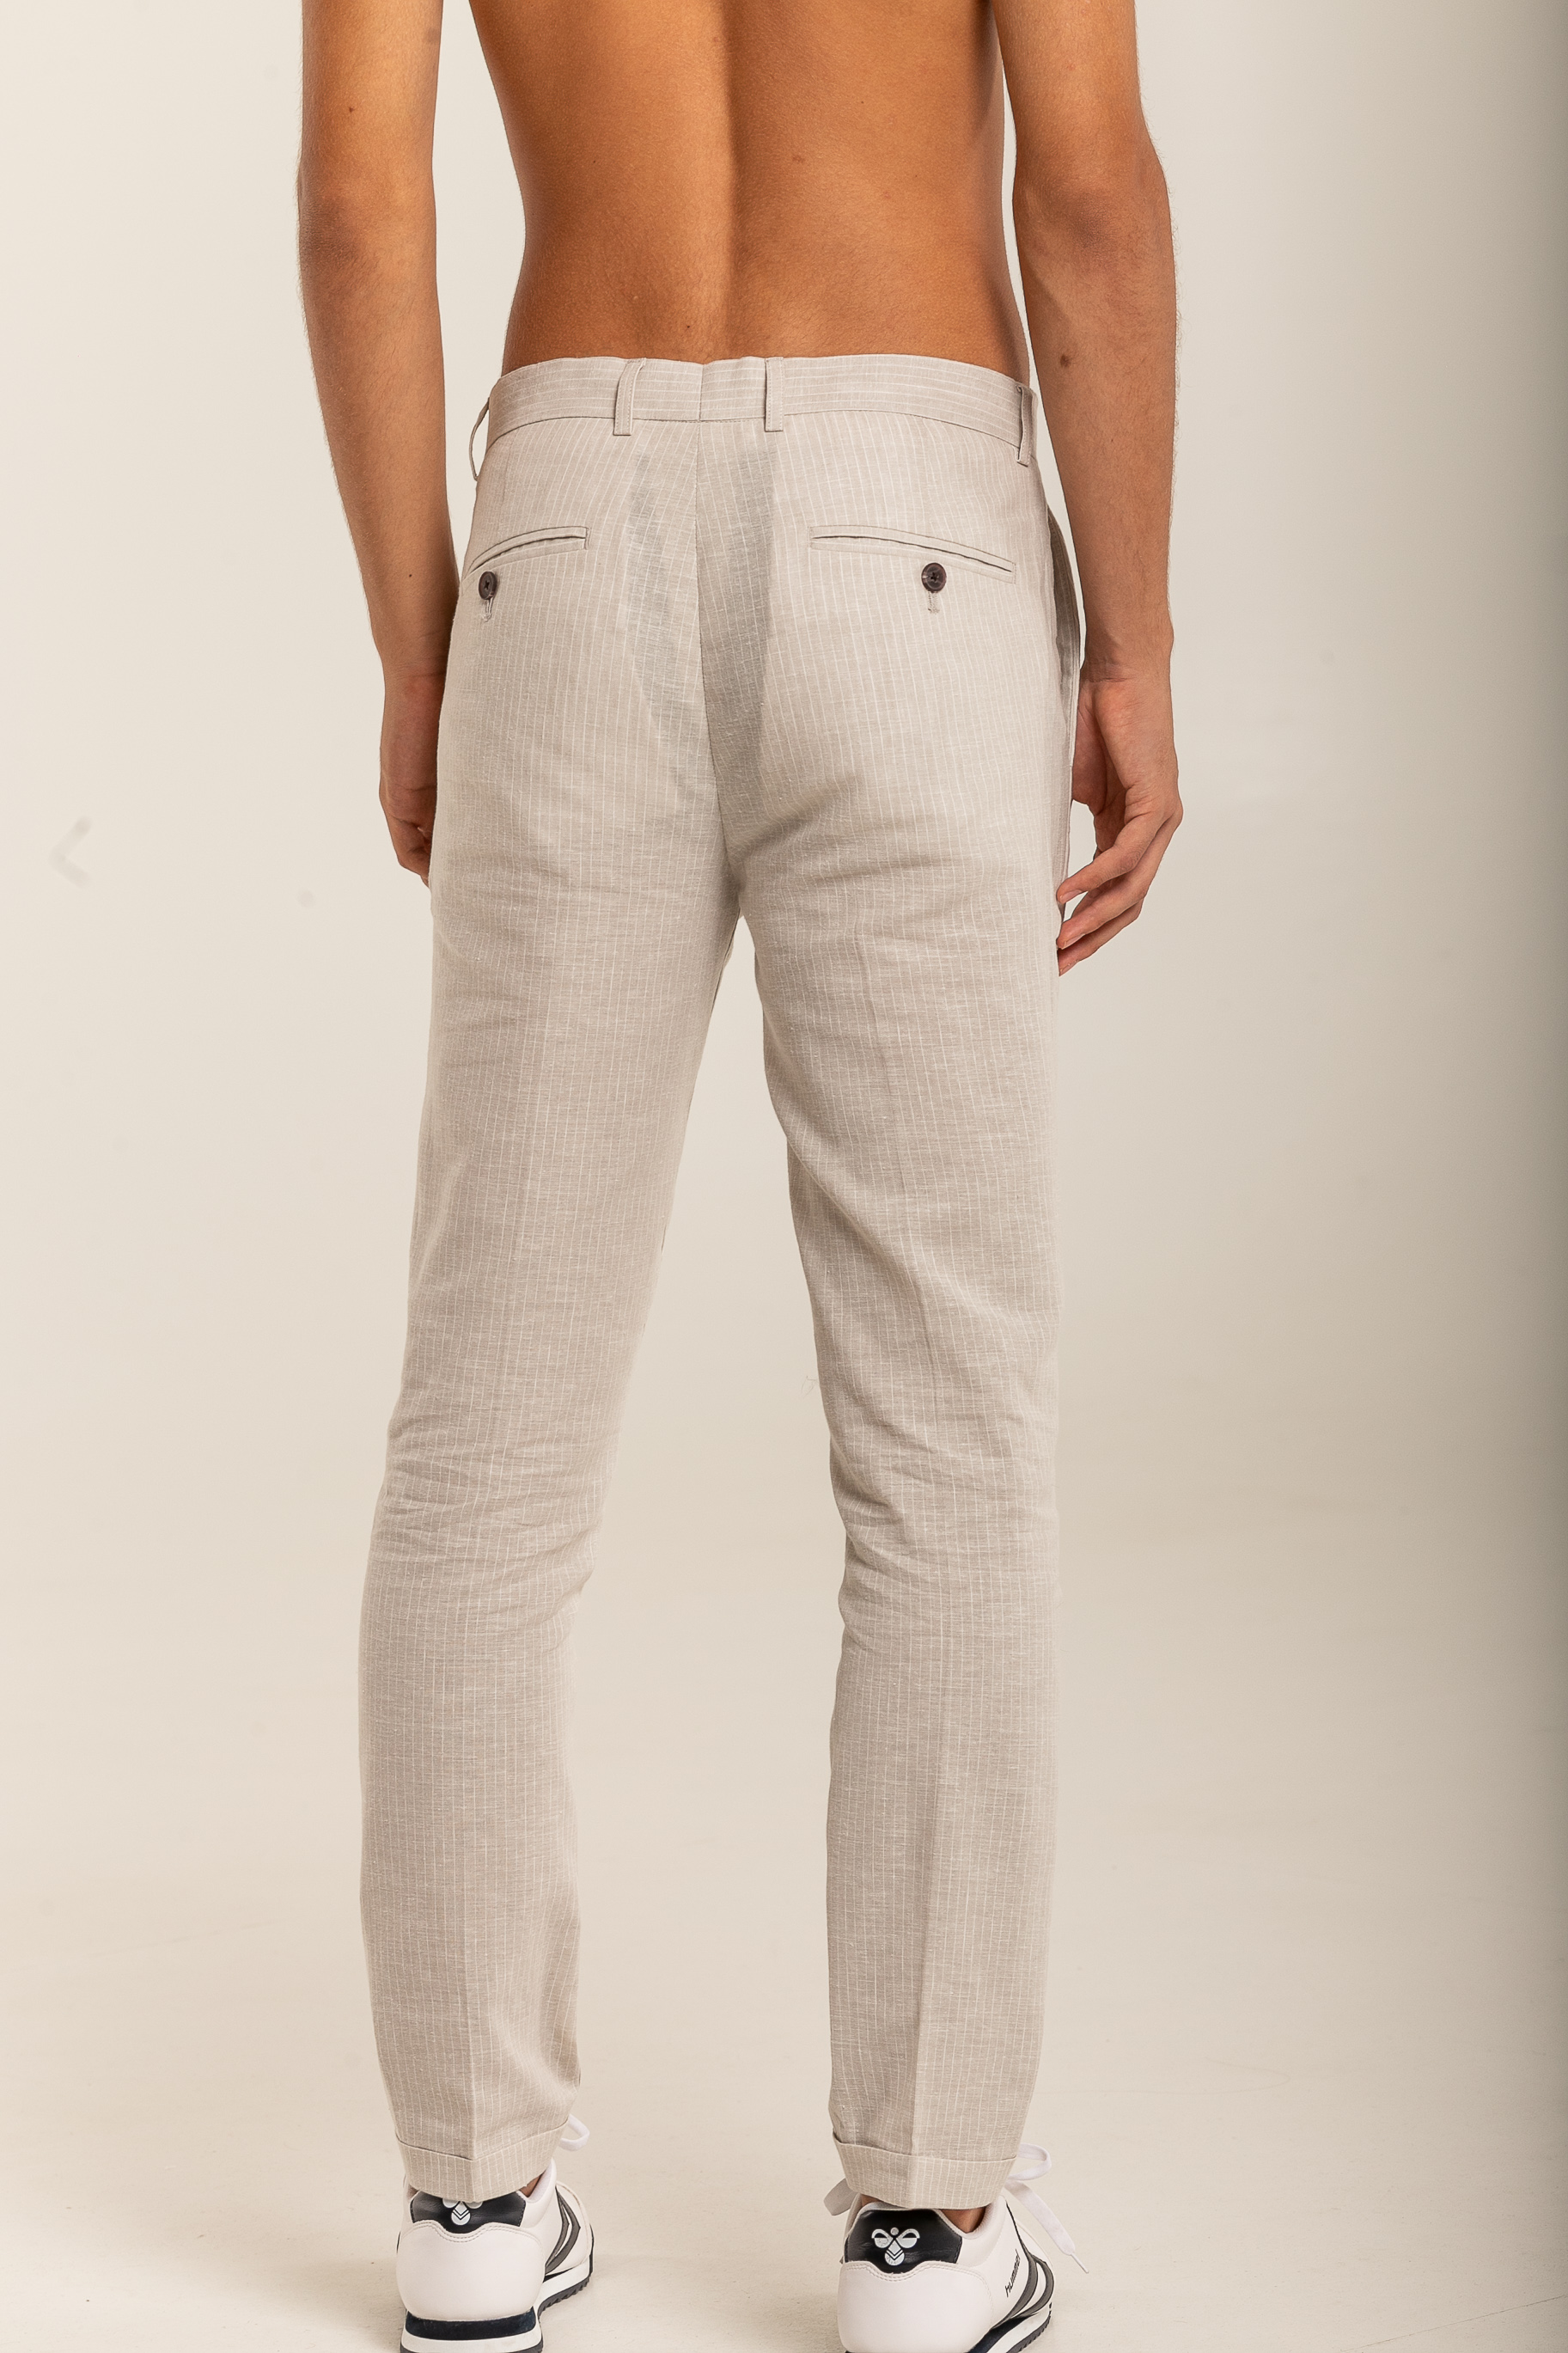 Pantaloni Jack & Jones Clasic (3731) photo 0